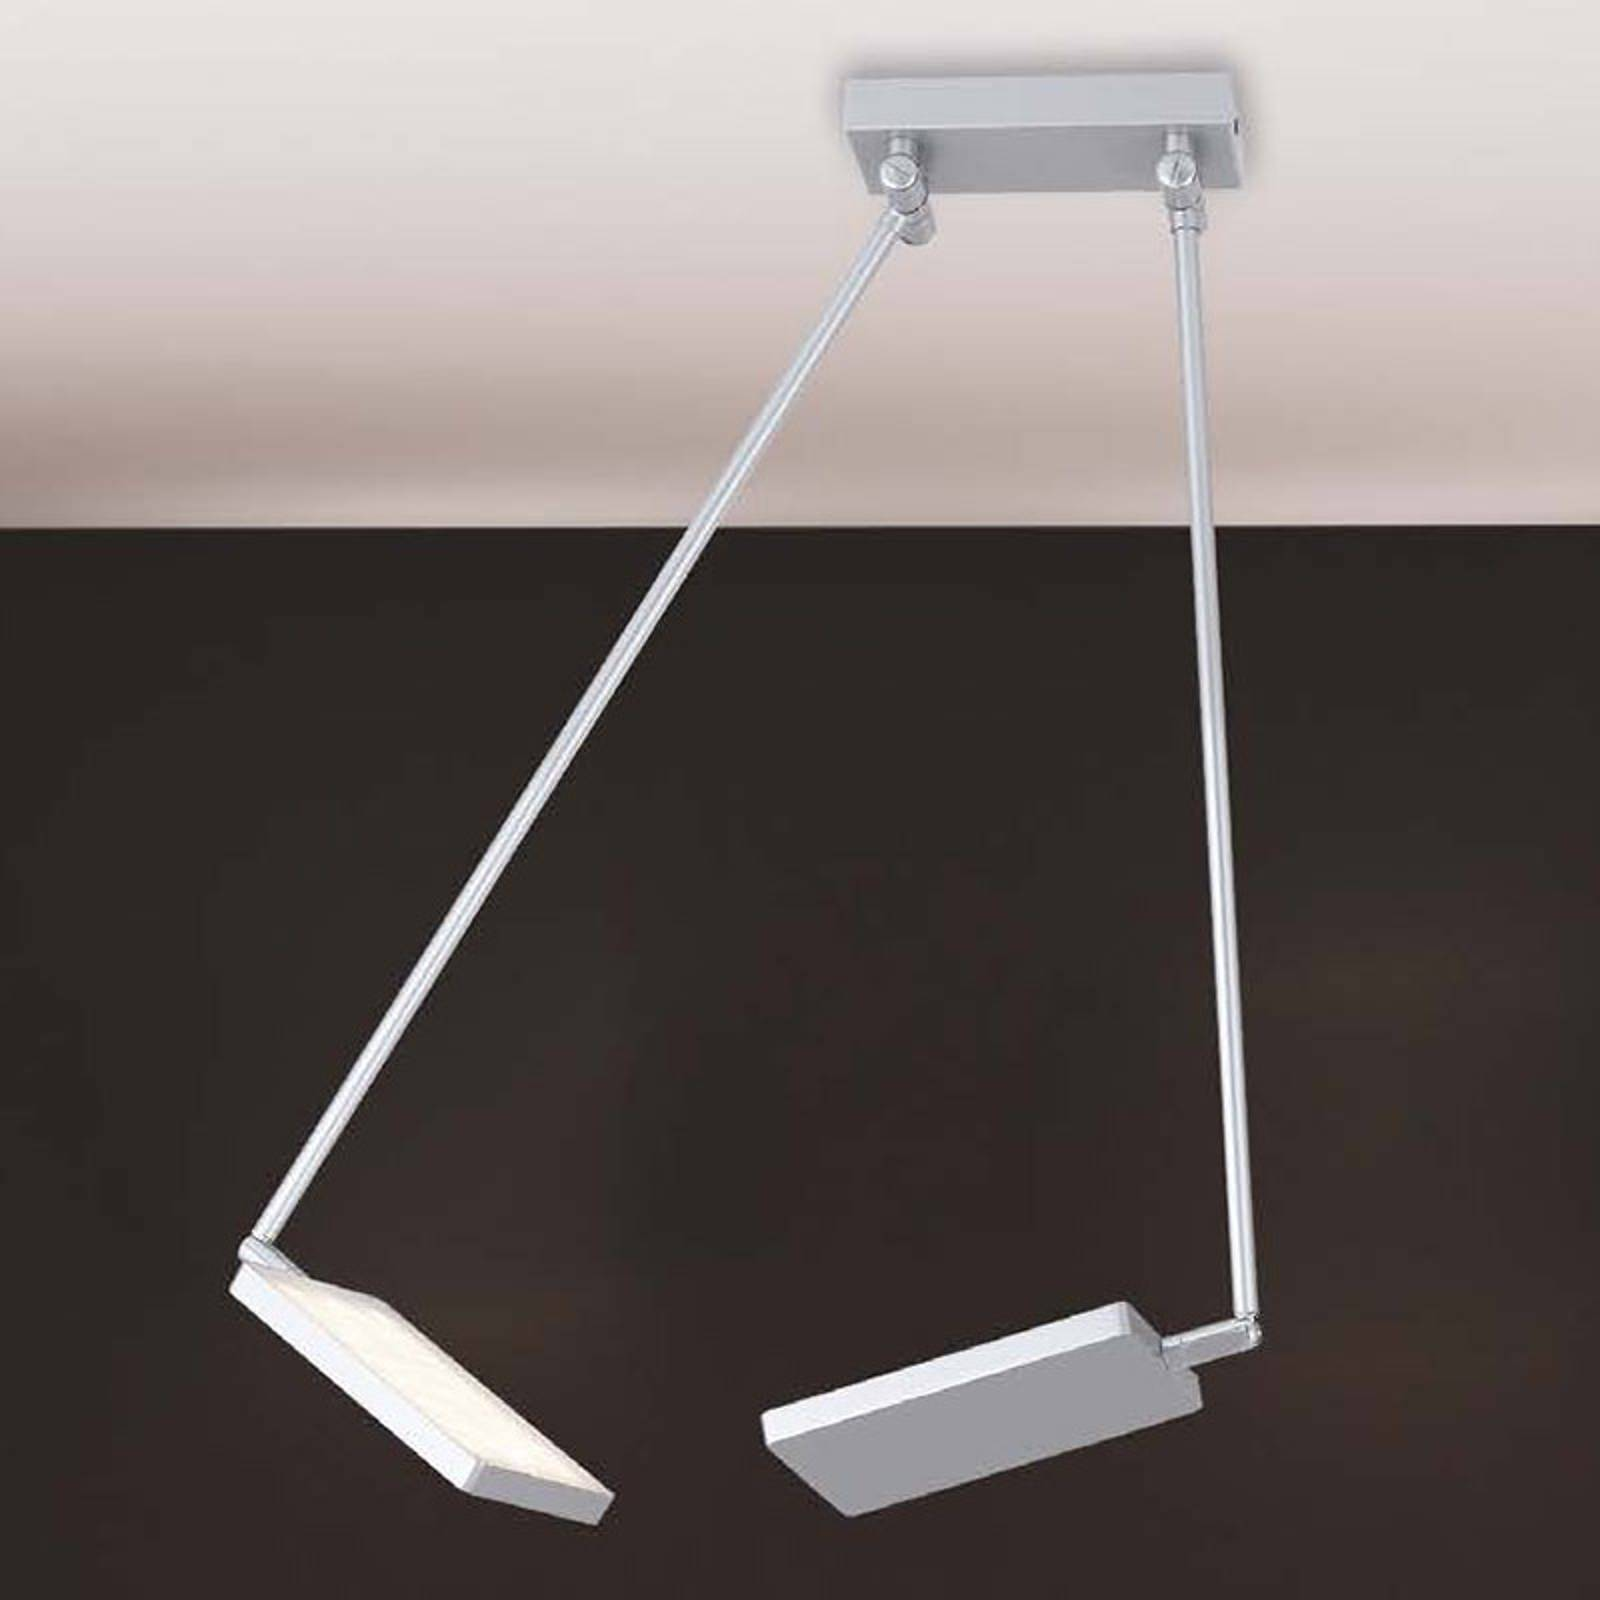 Lampa sufitowa LED Book, szara